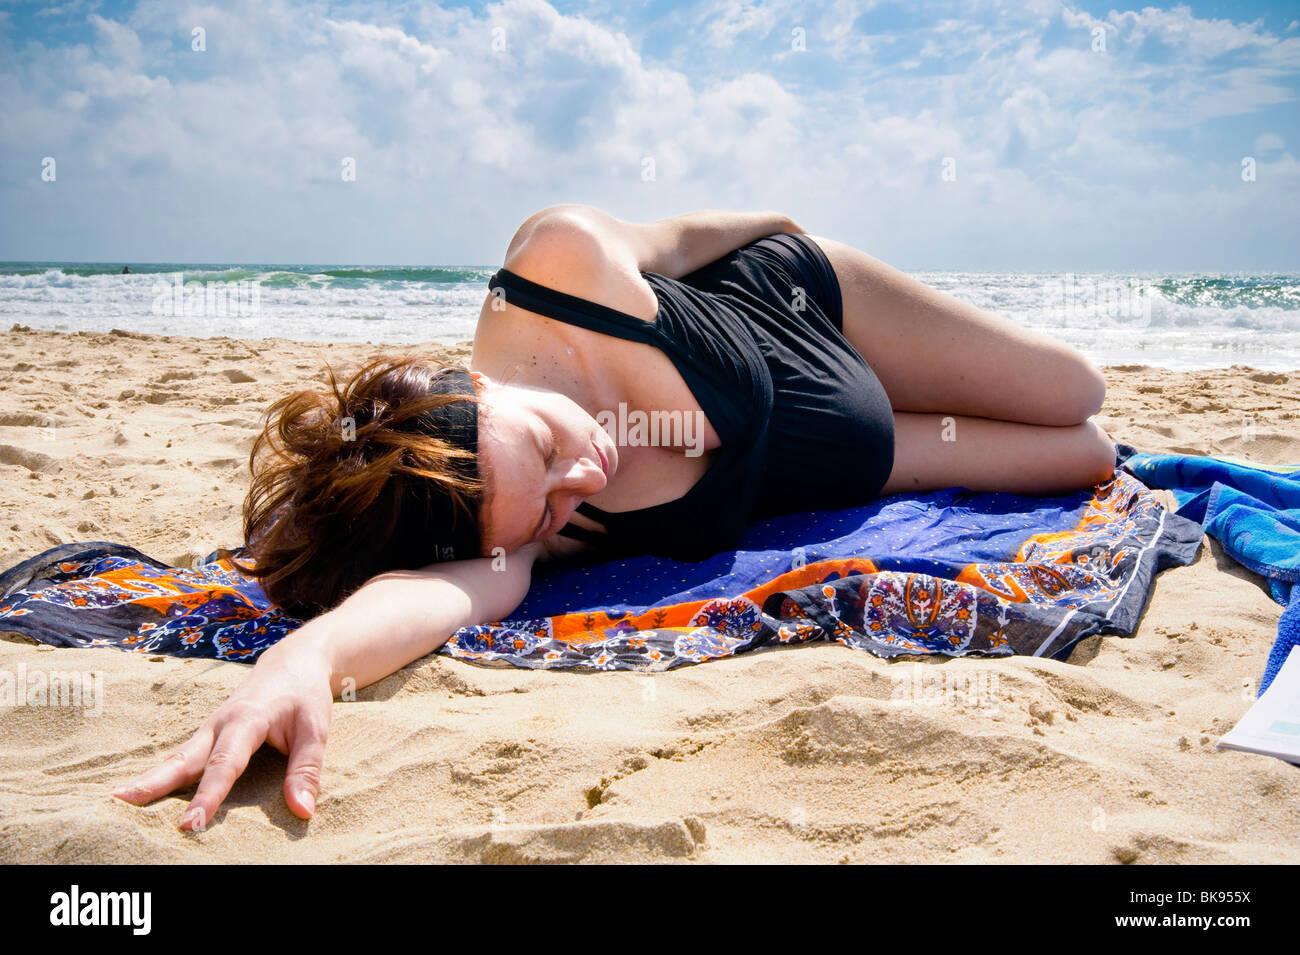 Schwangere Frau, die Festlegung auf den Strand vom Meer Stockbild